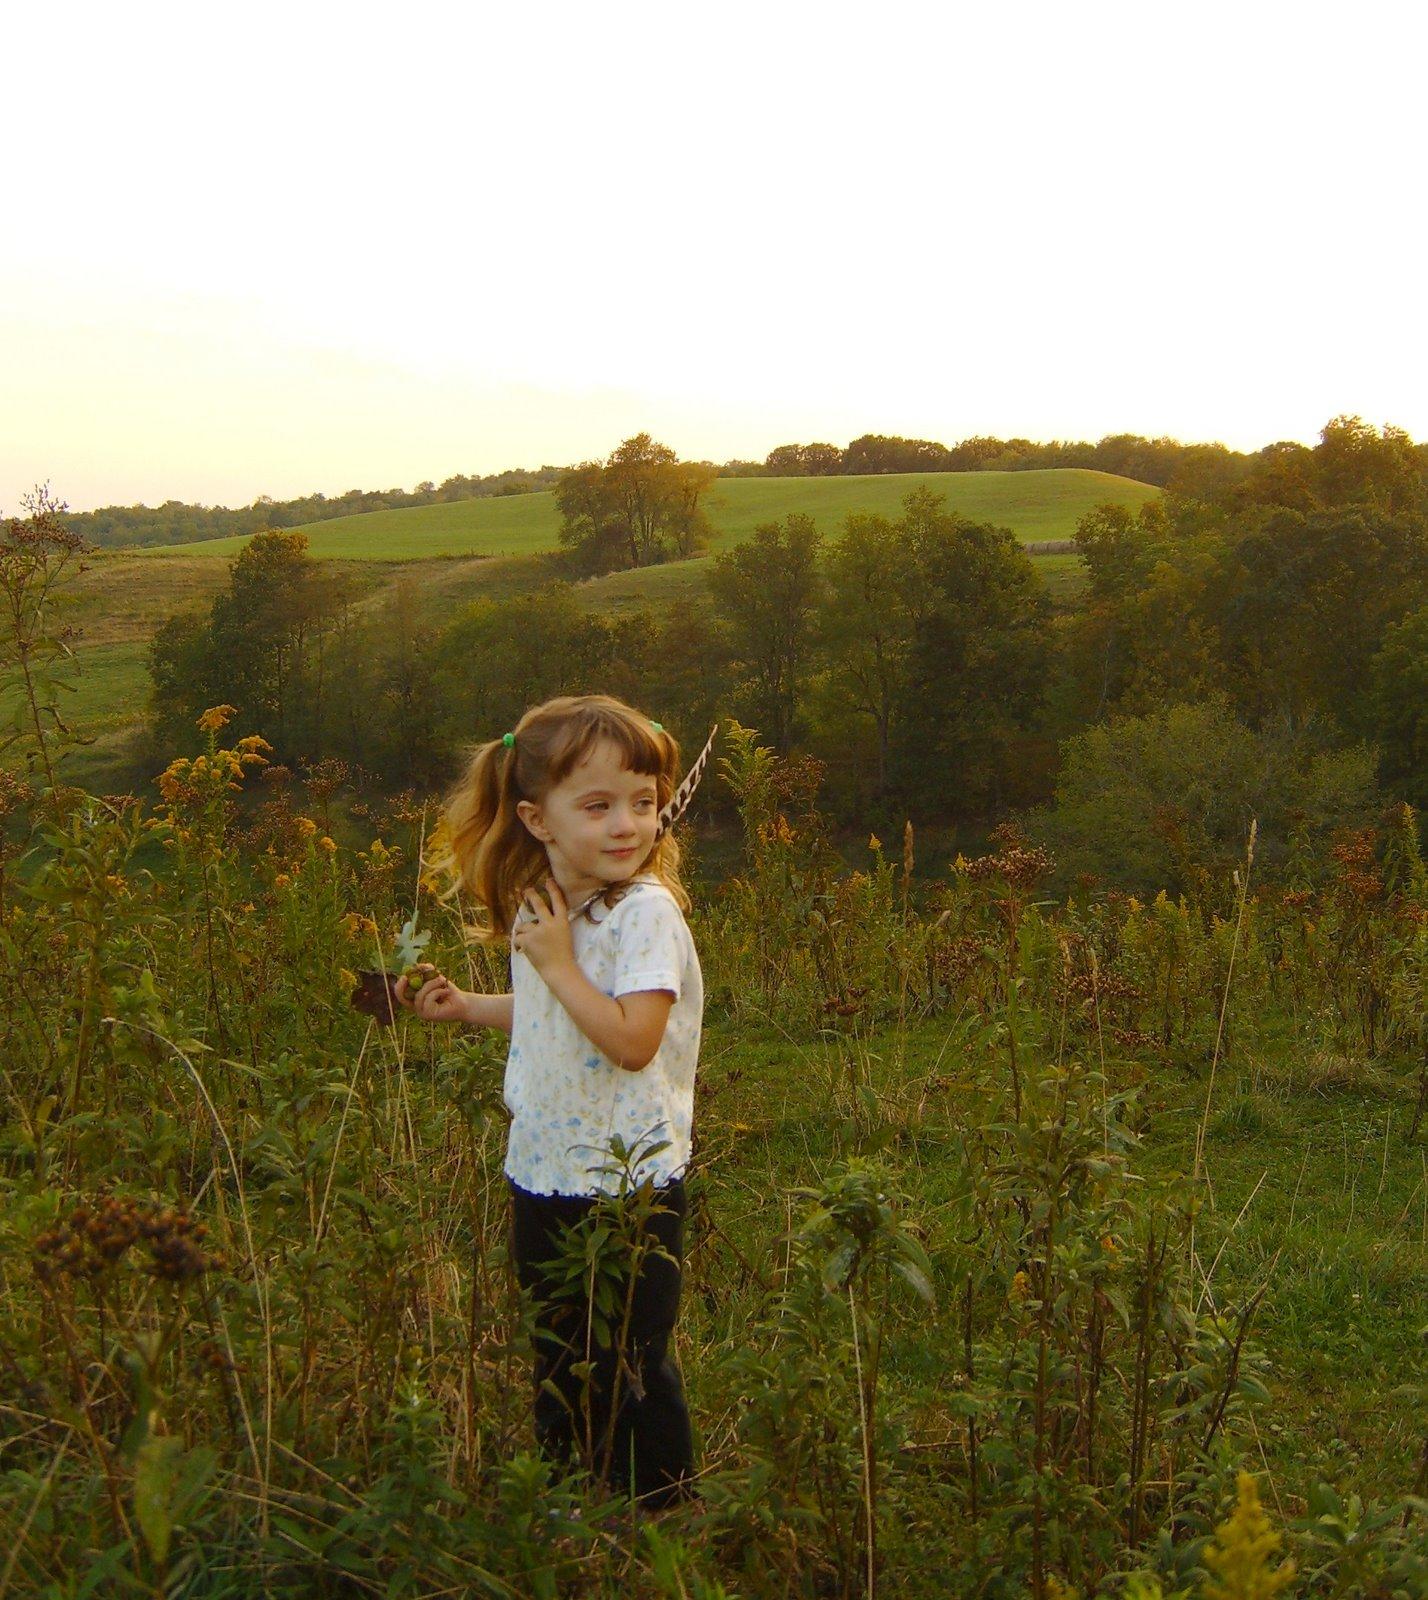 Emily on an adventure walk!